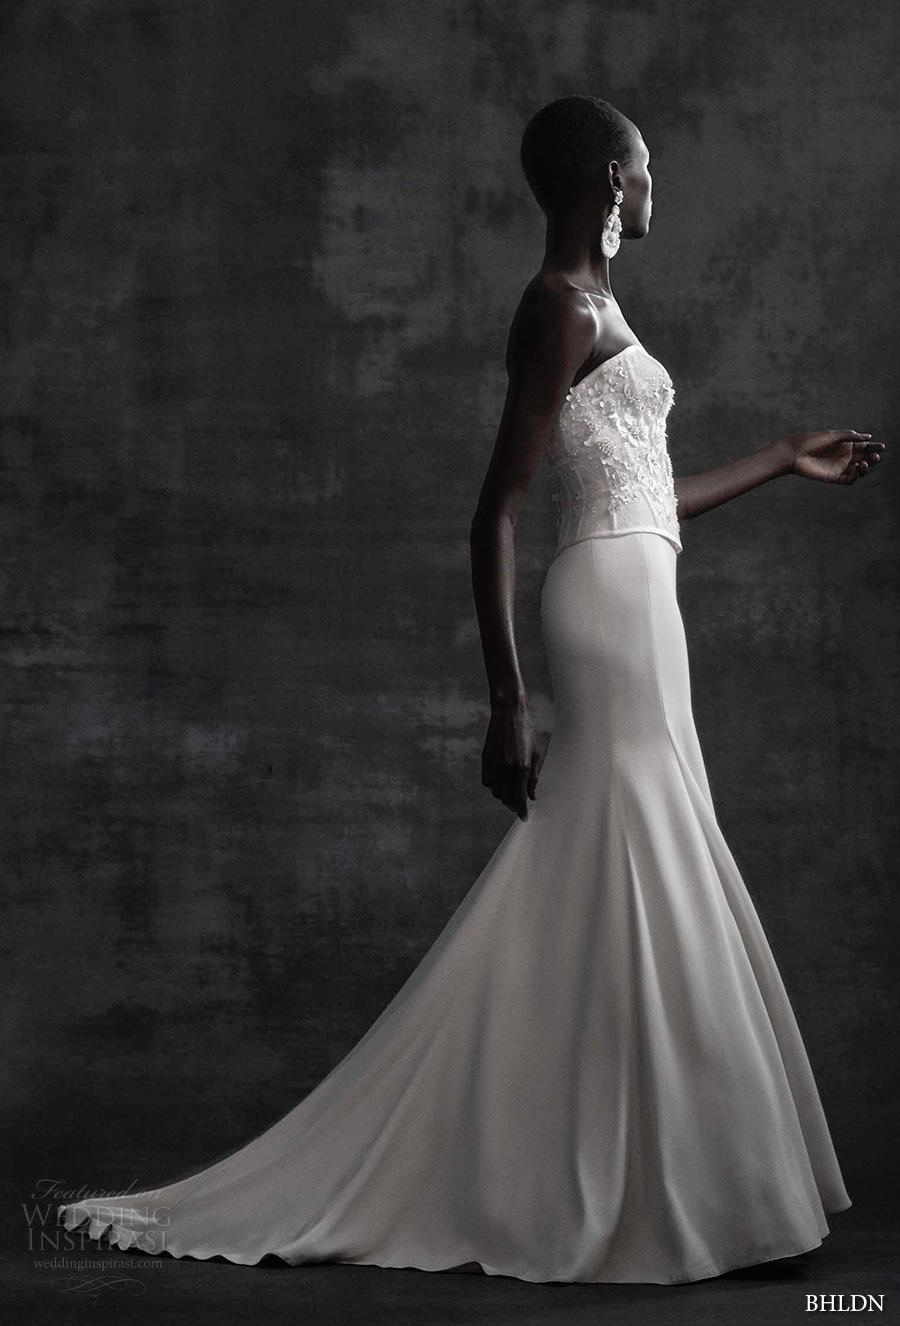 bhldn spring 2017 bridal strapless sweetheart neckline heavily embellished bodice corset elegant column wedding dress sweep train (maryna corset sade skirt) sdv